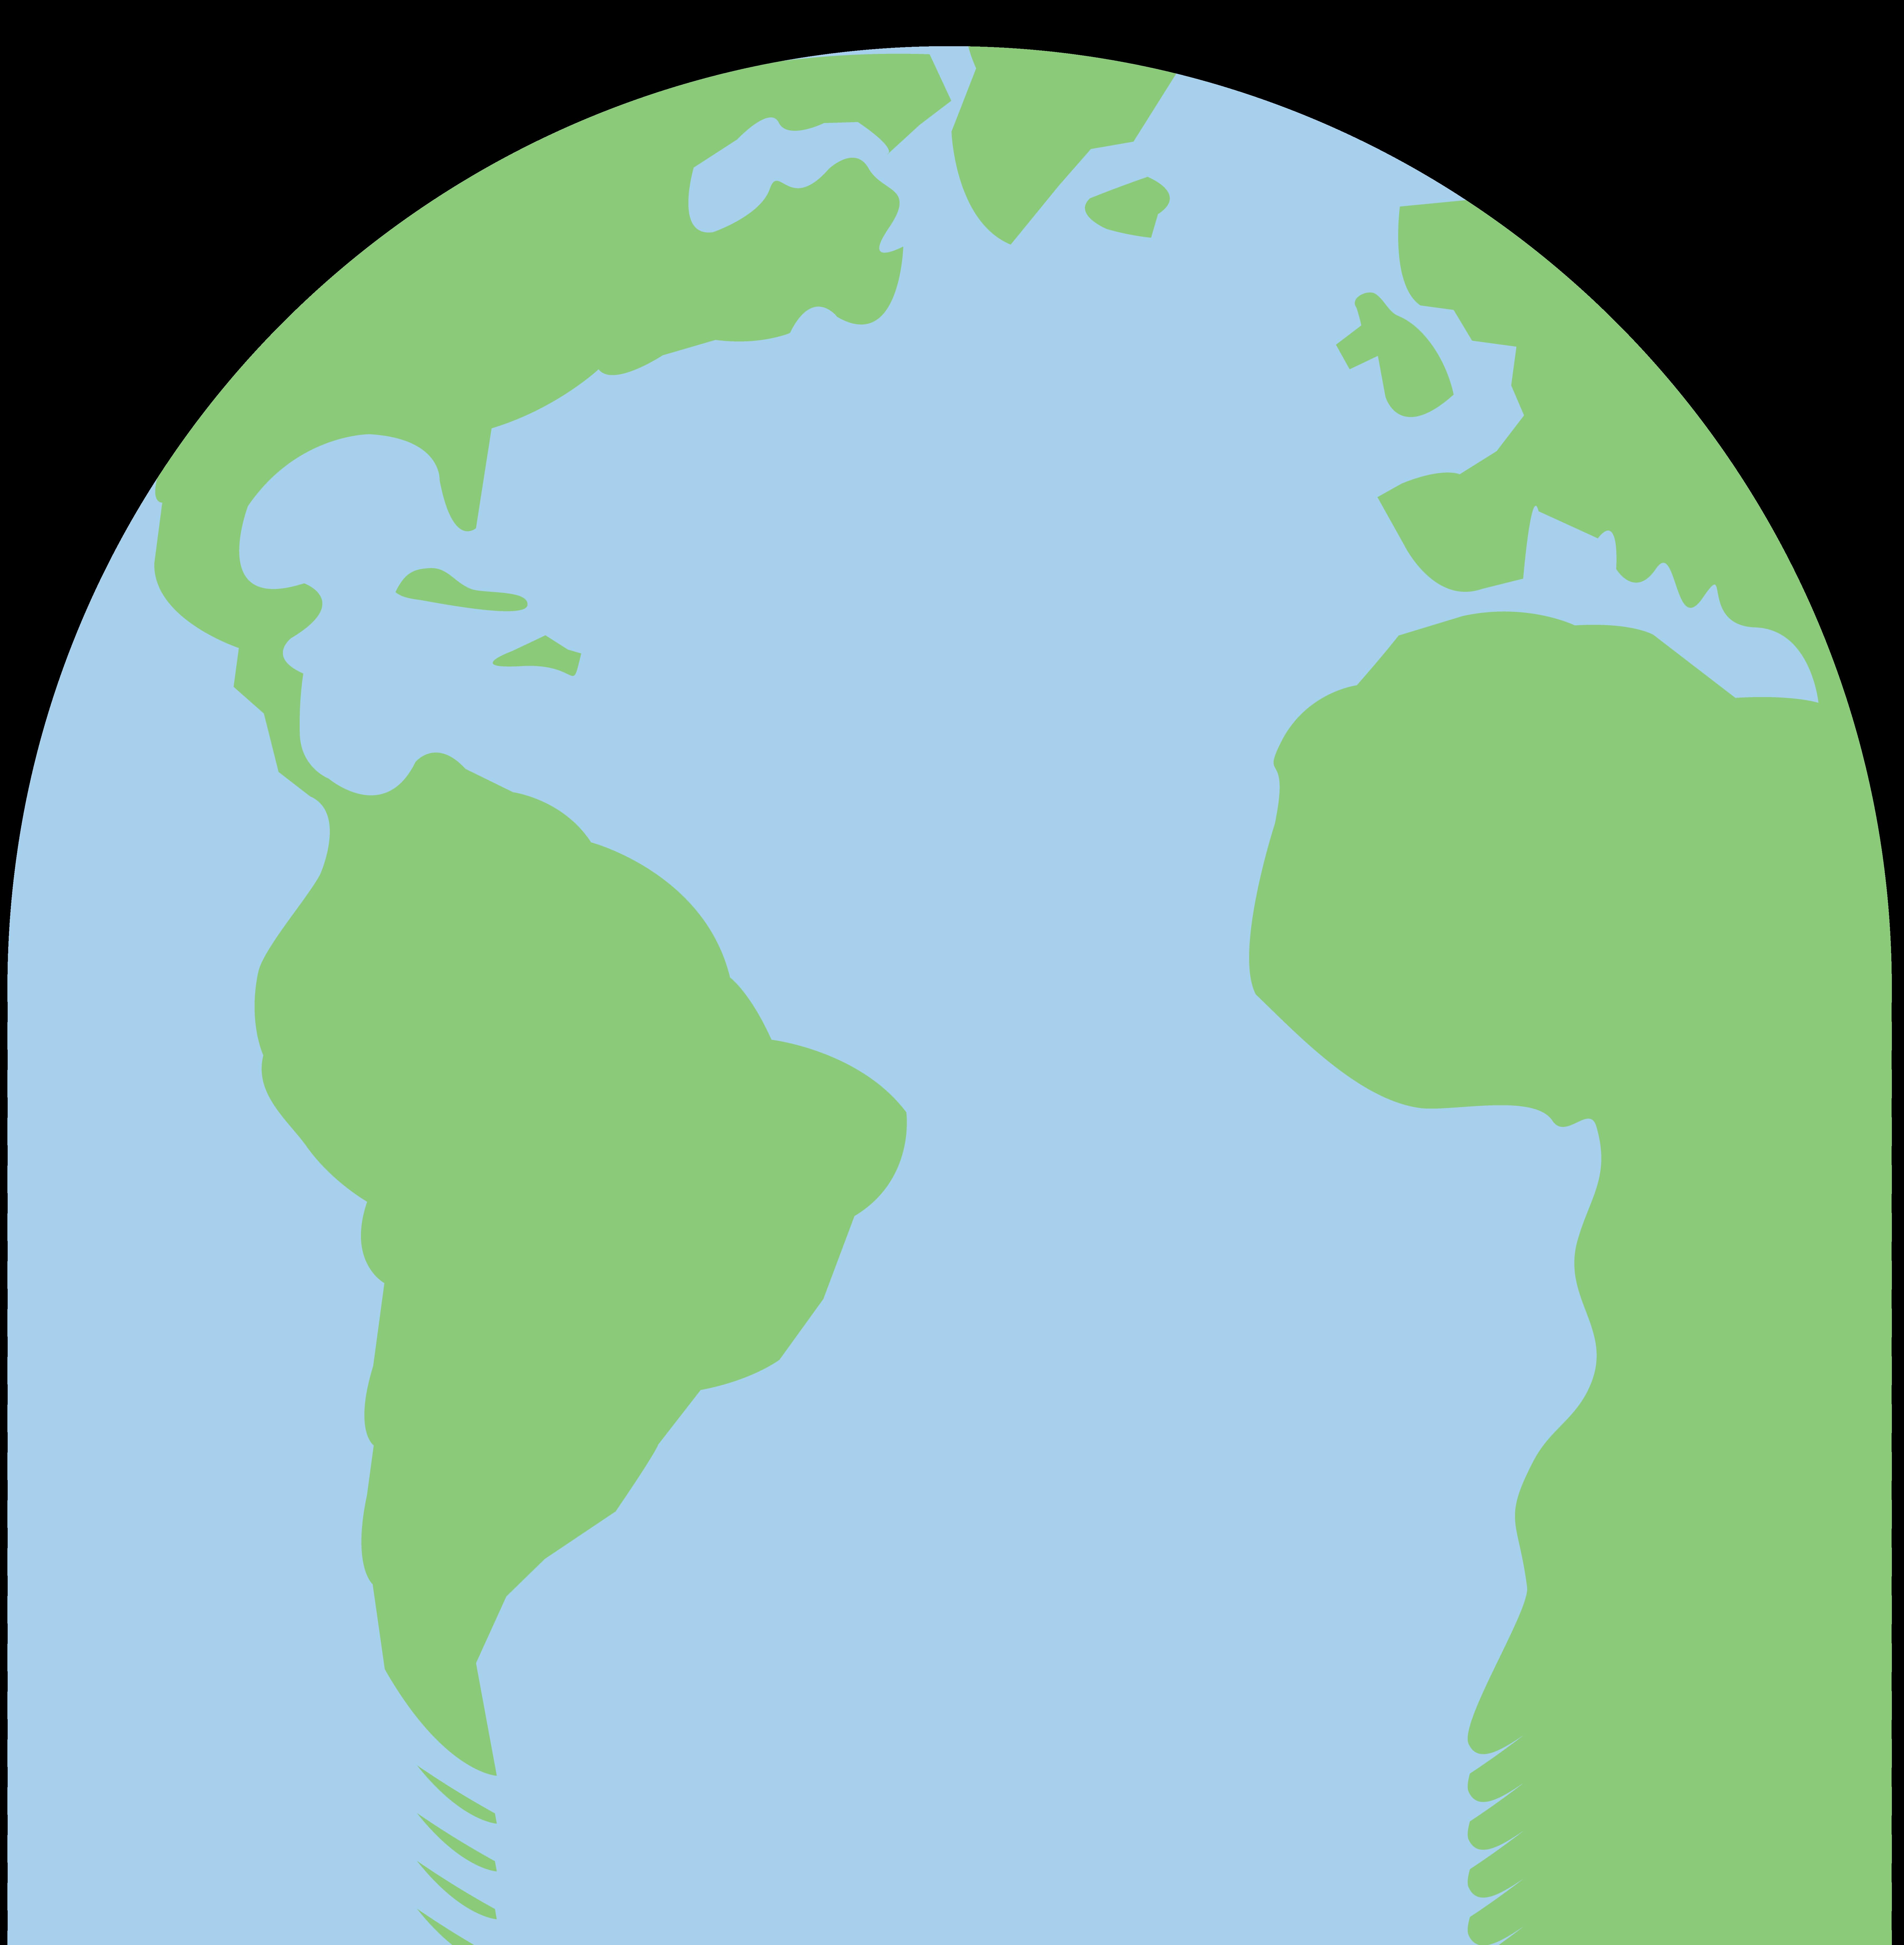 Free Cartoon Planet Earth, Download Free Clip Art, Free Clip.